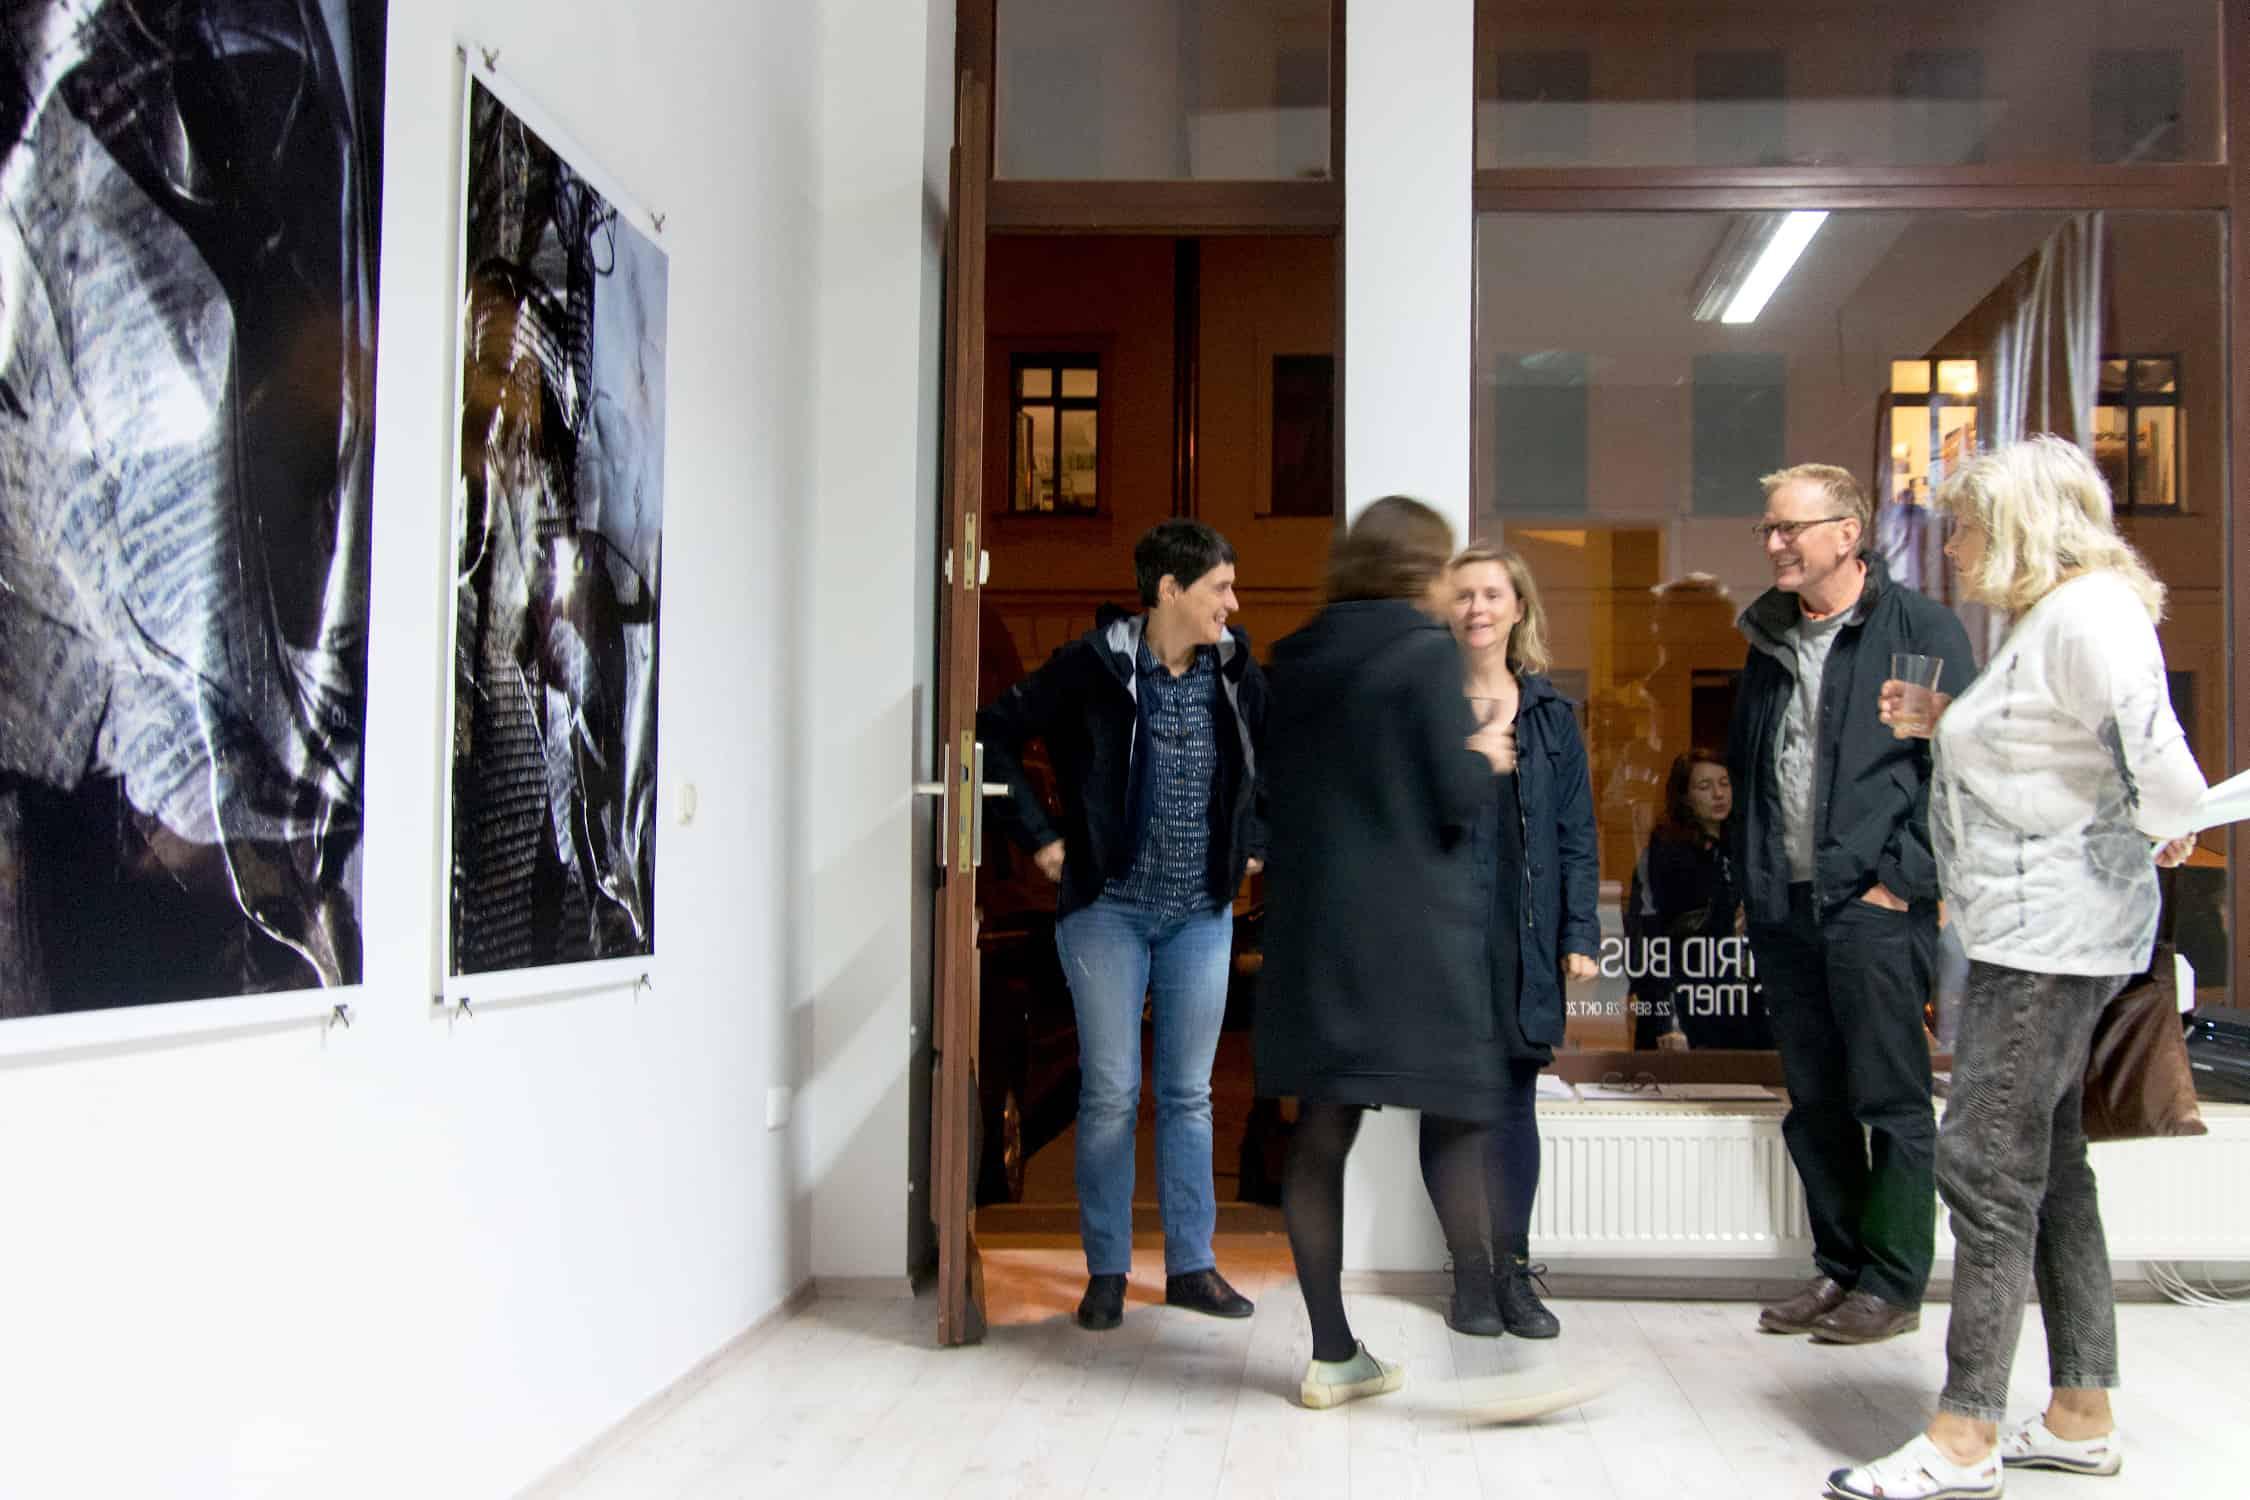 astrid-busch-kunstraum-neudeli-leipzig-2018-5